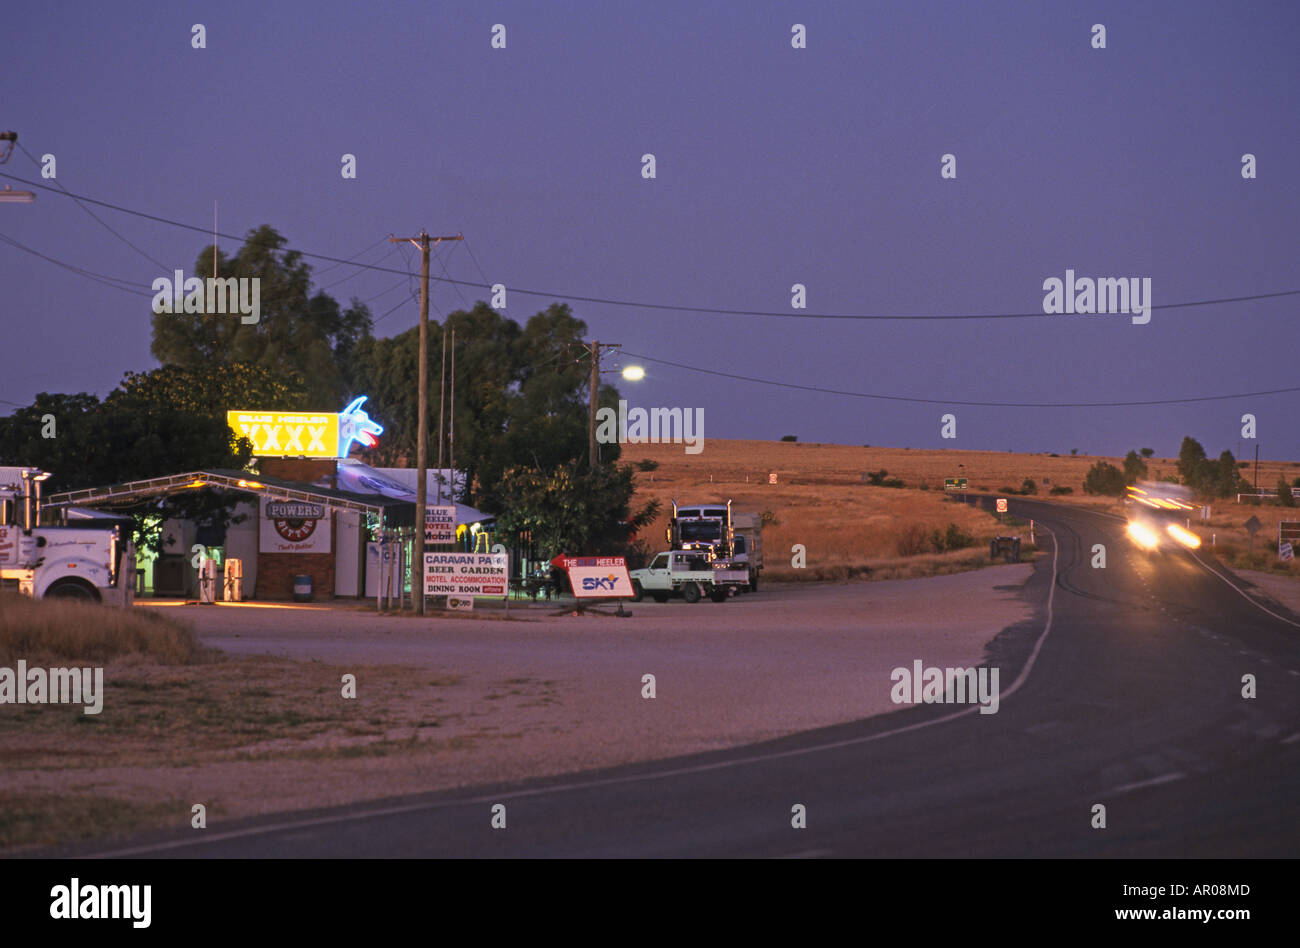 Outback hotel, Blue Heeler, Matilda Hwy, Australien, Queensland, Maltilda Highway, Blue Heeler Hotel Kynuna on the Matilda Hwy a - Stock Image